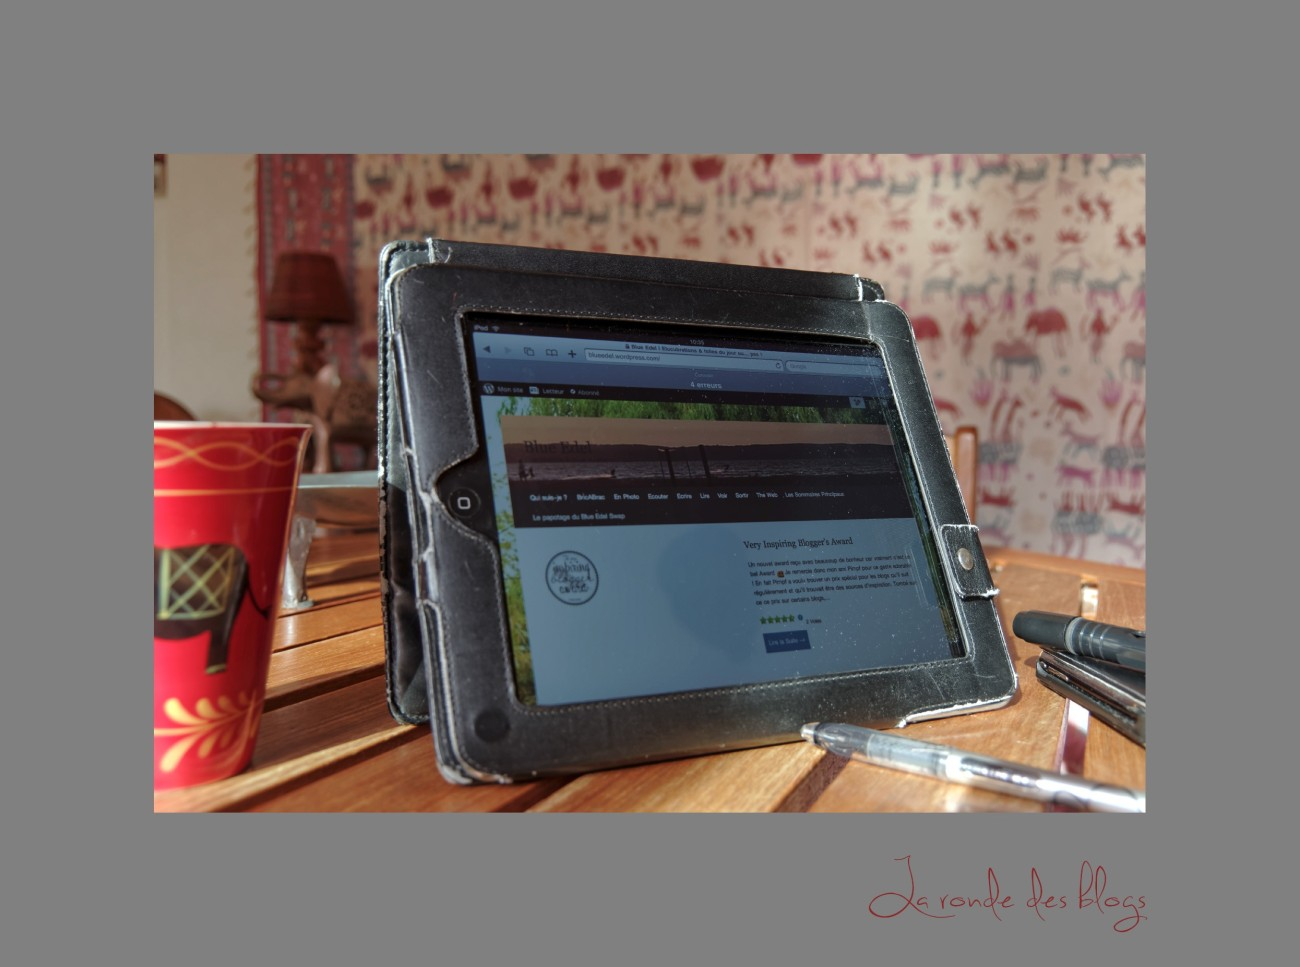 ipad, blogs, ronde des blogs, Very Inspiring Blogger's Award